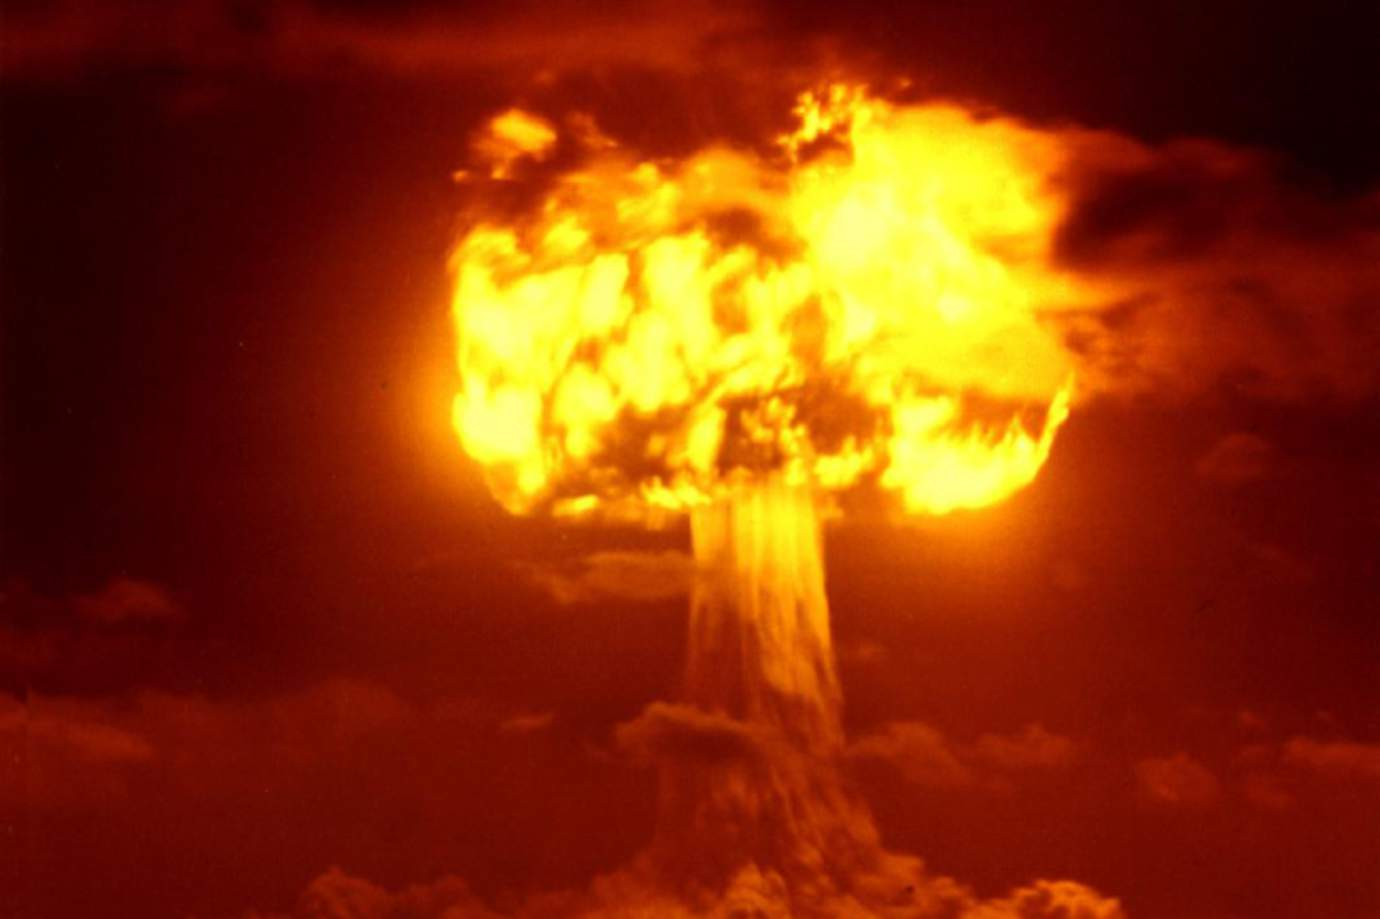 Anggota tetap Dewan Keamanan PBB tidak mendukung Perjanjian tentang Larangan Senjata Nuklir